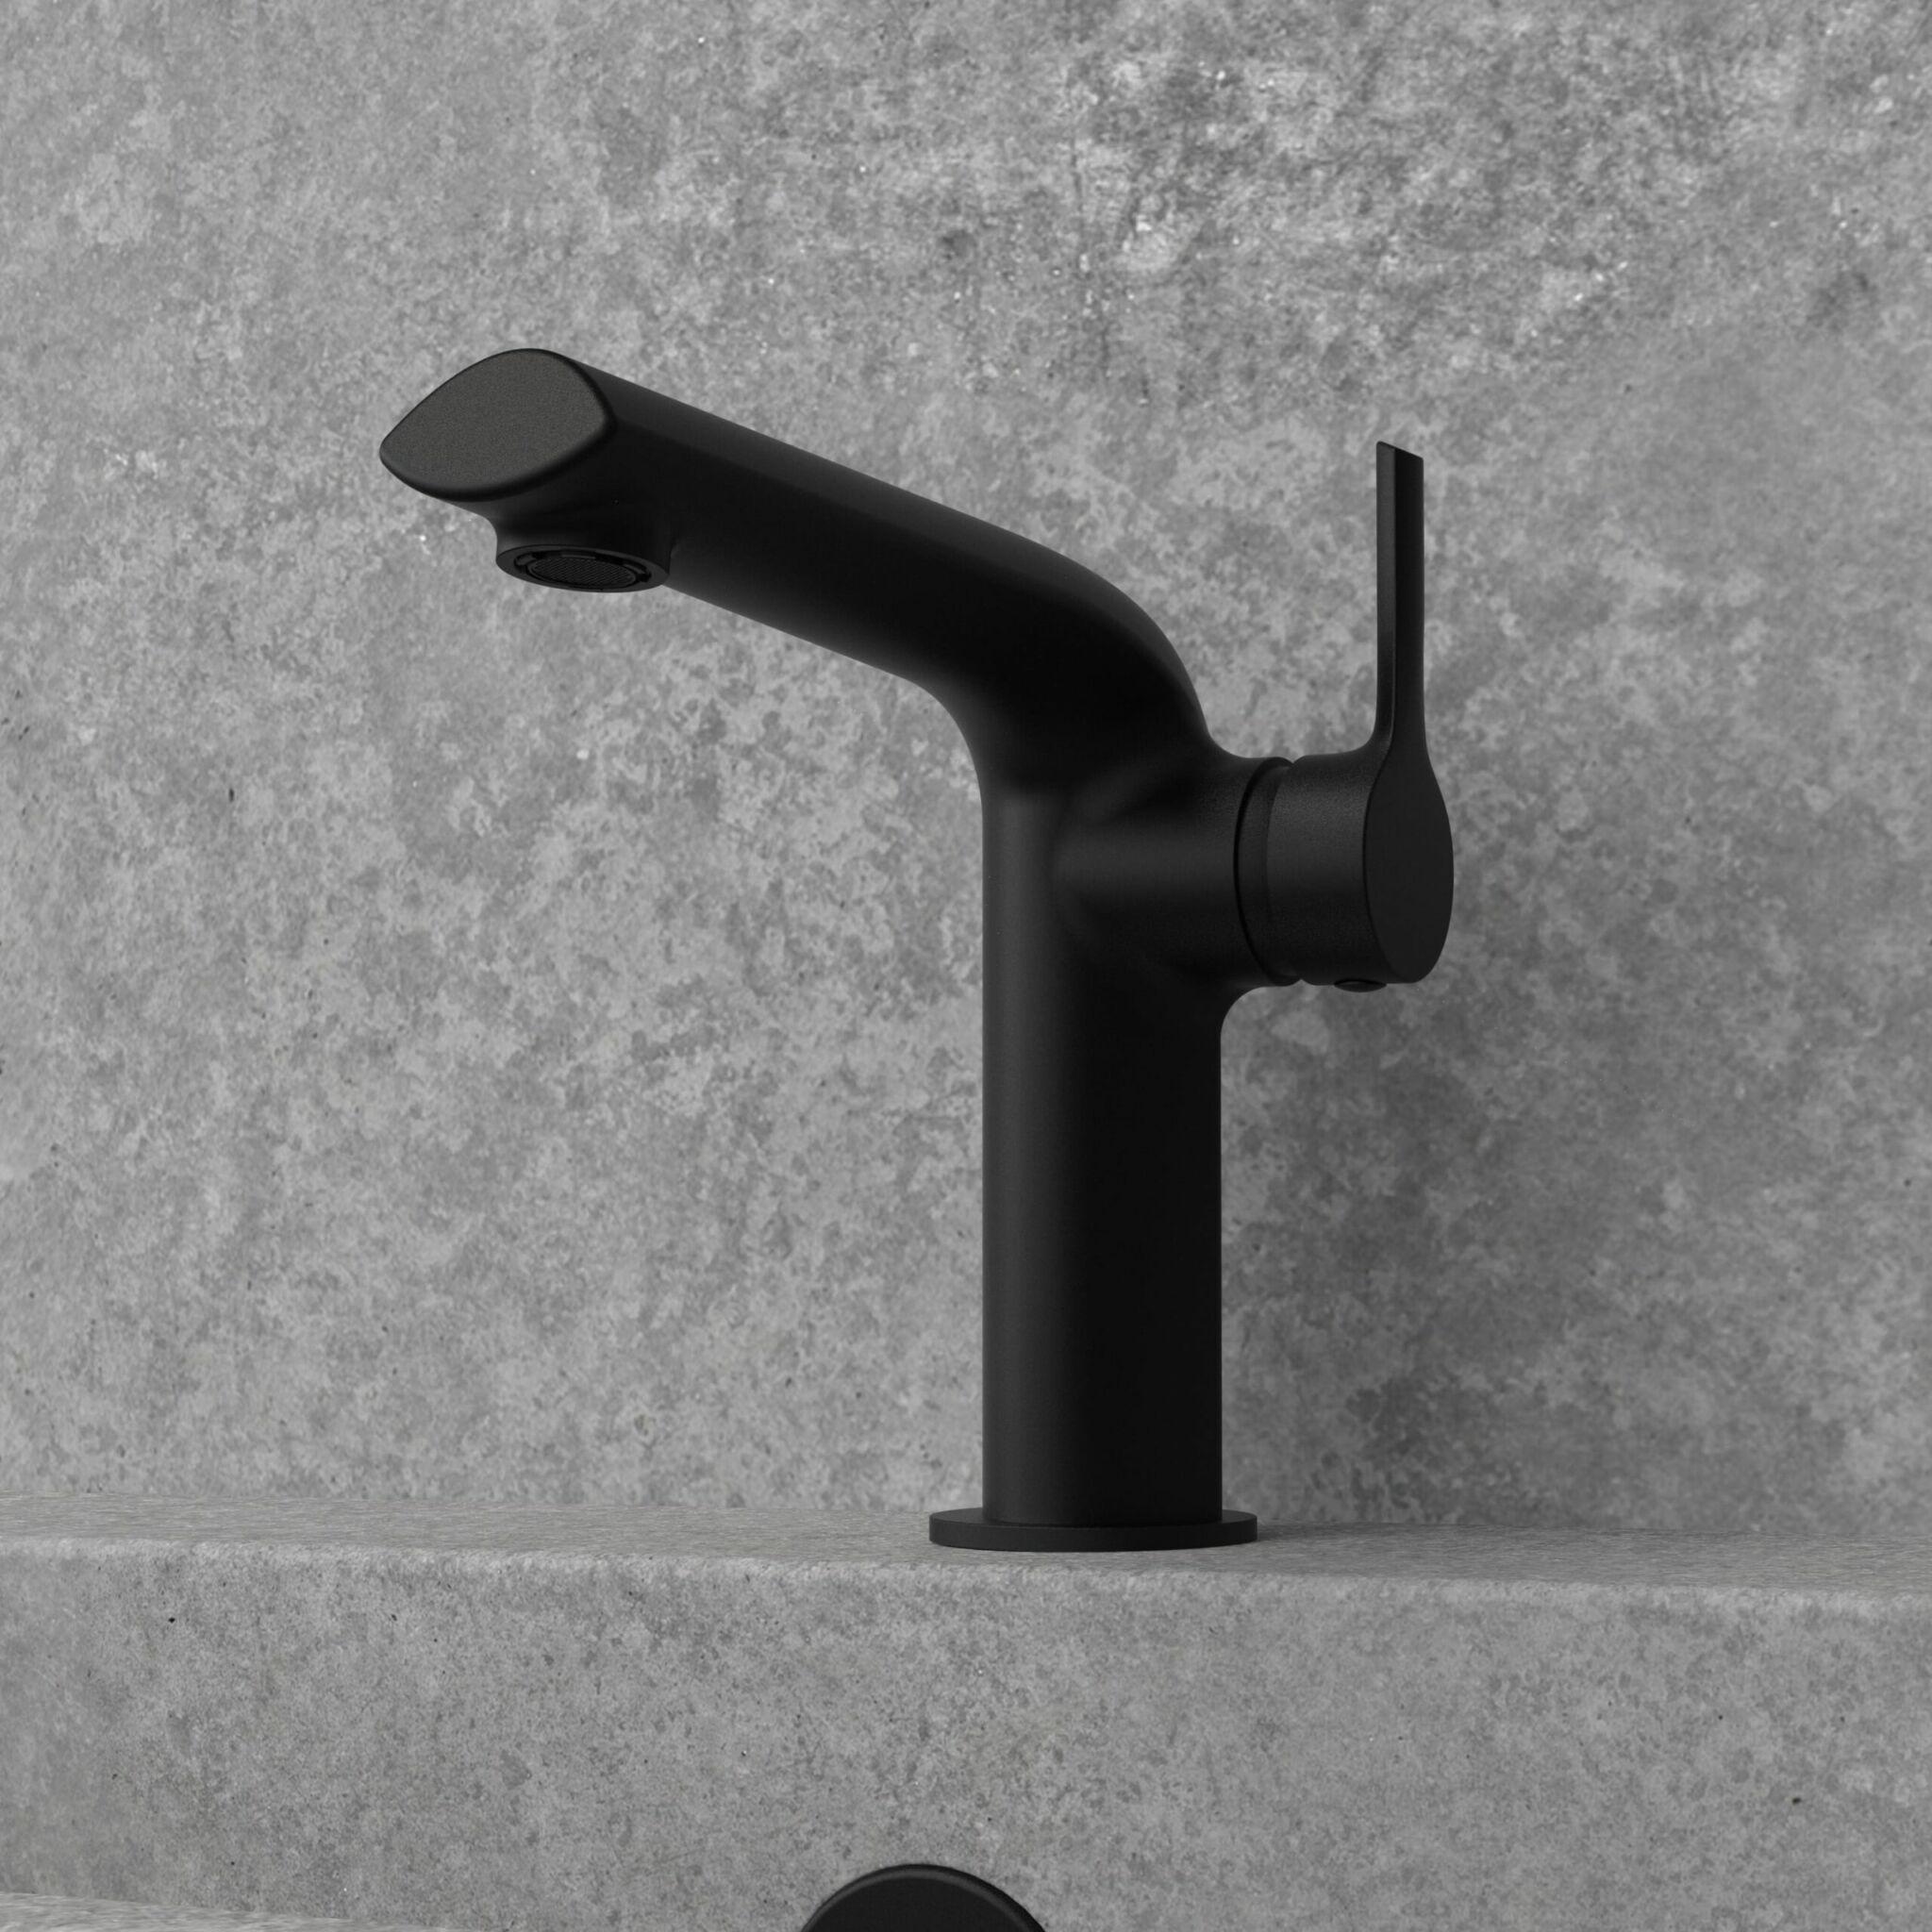 NOB22MB - robinet de lavabo noir mat avec mur granit